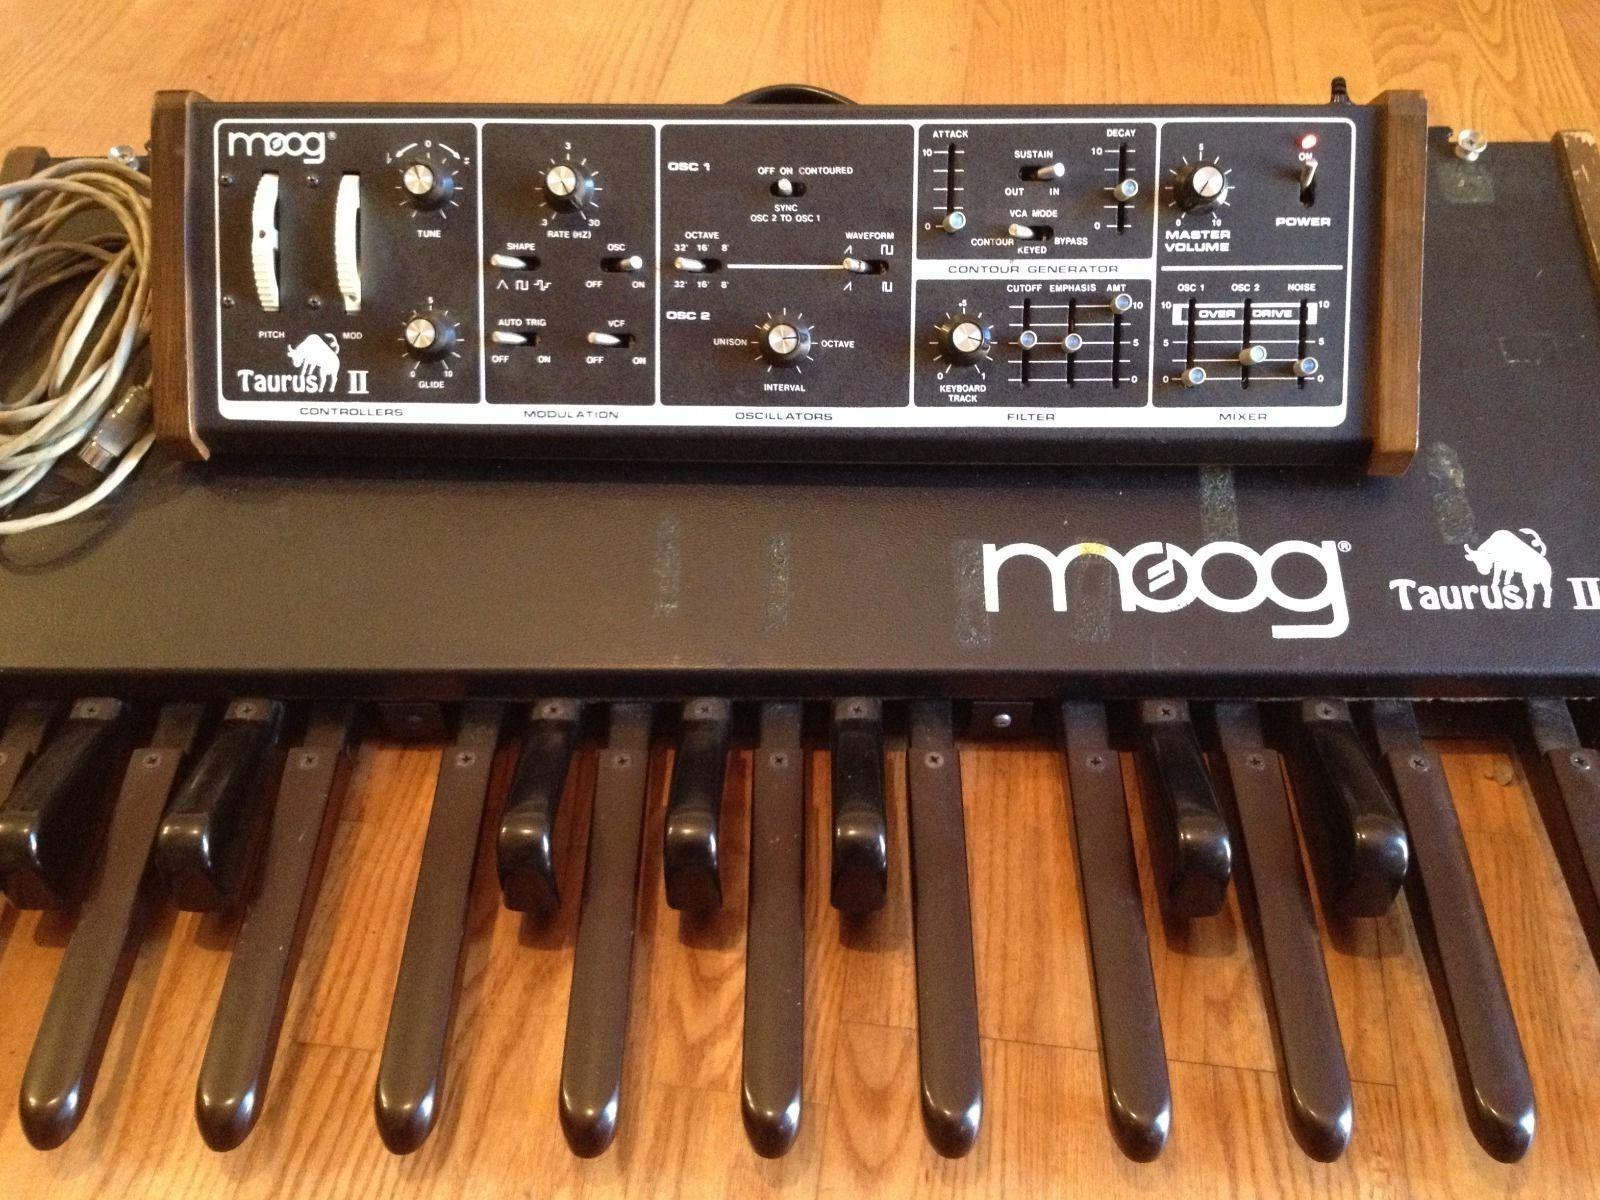 subaru 2 2 engine electrical schematics moog taurus schematics 2 matrixsynth: moog taurus 2 pedals and analog synthesizer ... #8